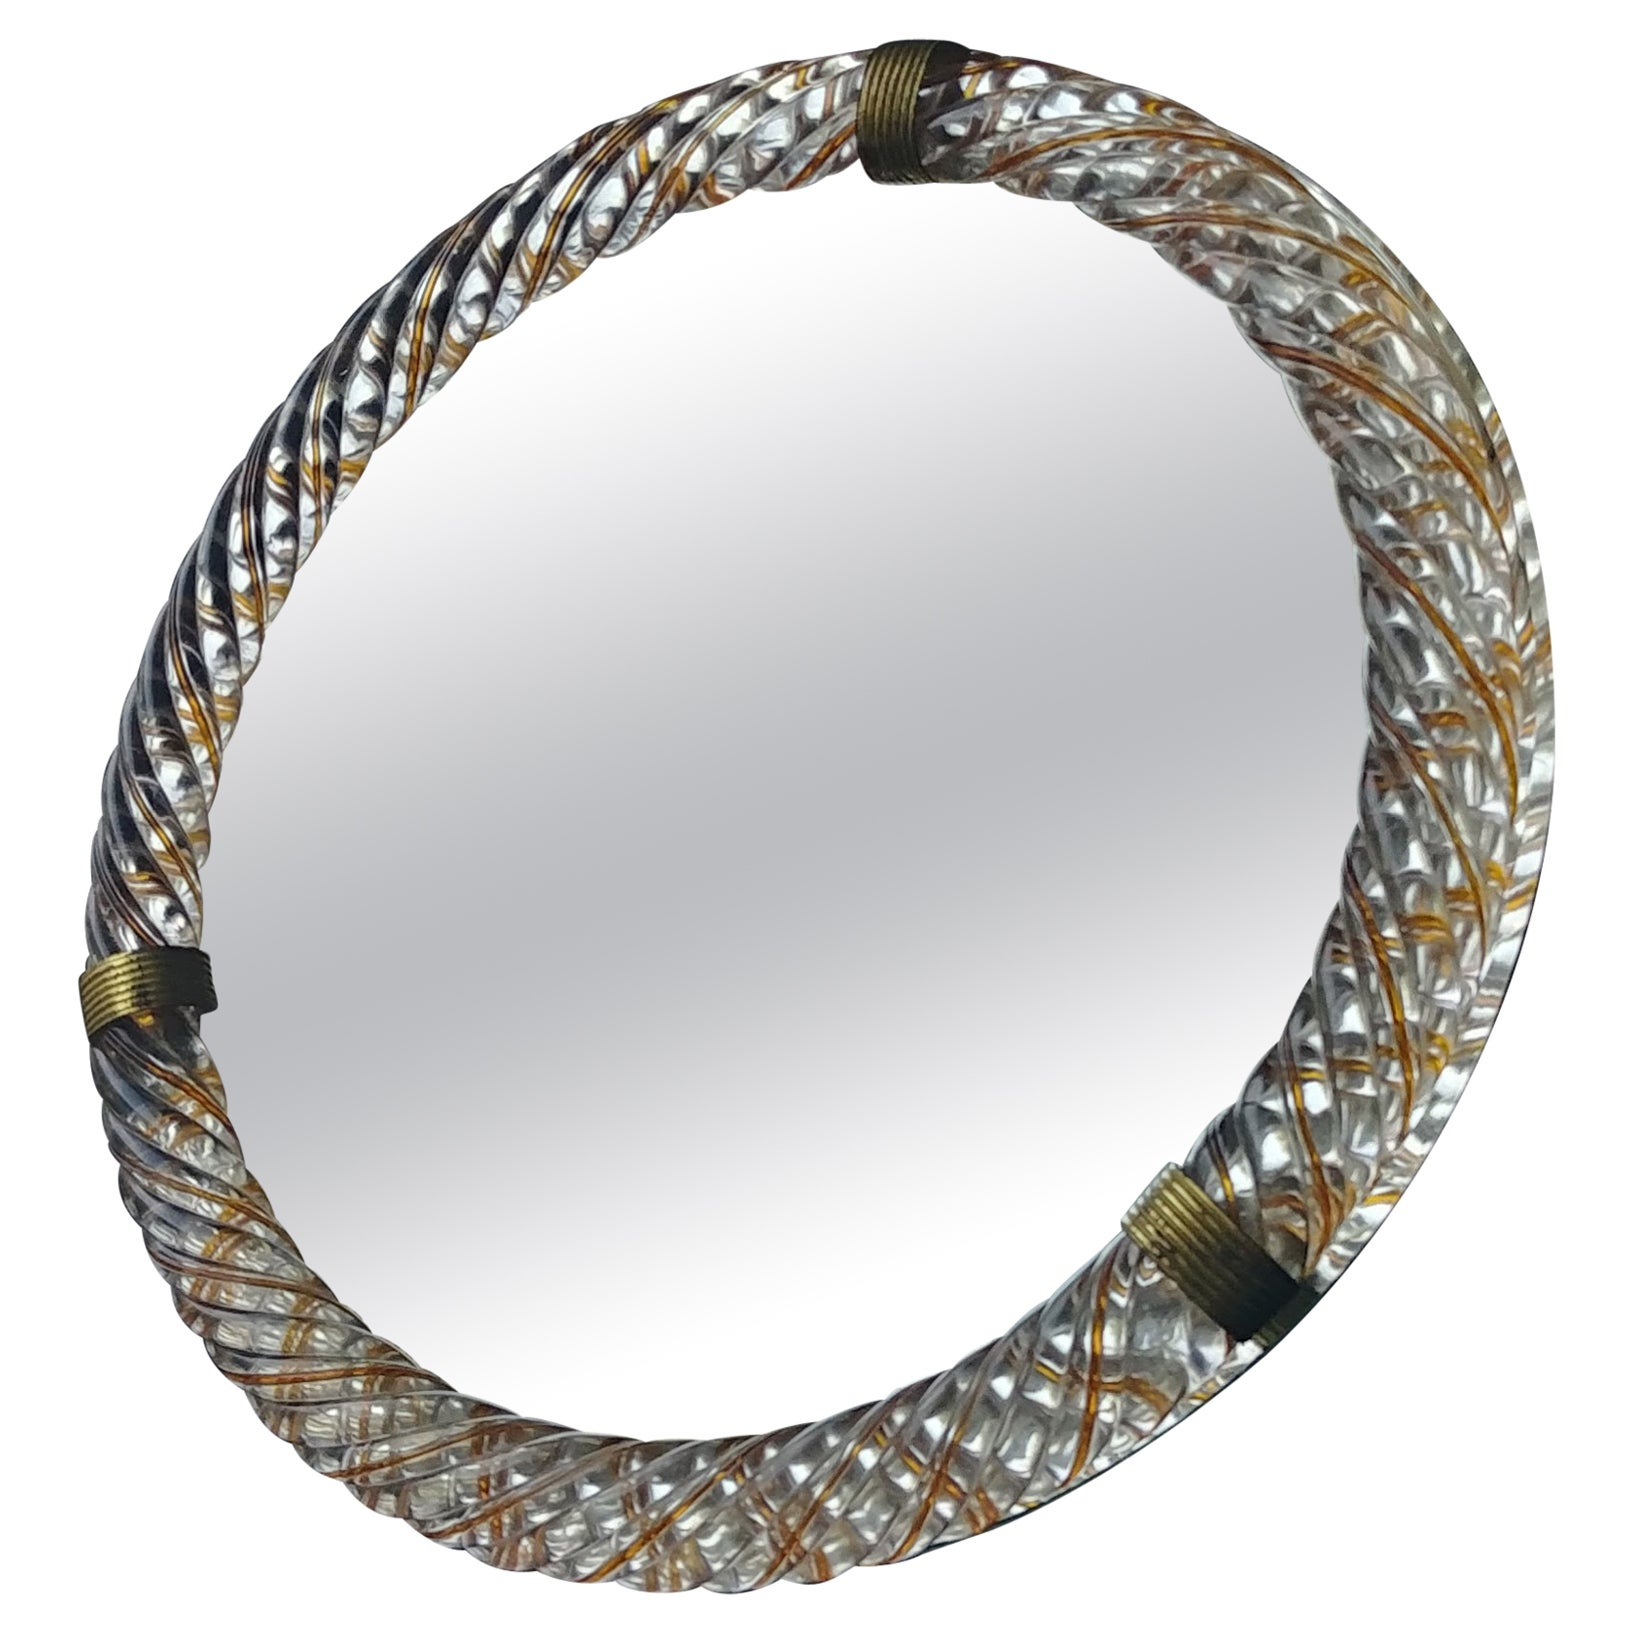 Barovier & Toso, Threaded Yellow/Gold Murano Glass Wall/Table, Vanity Mirror